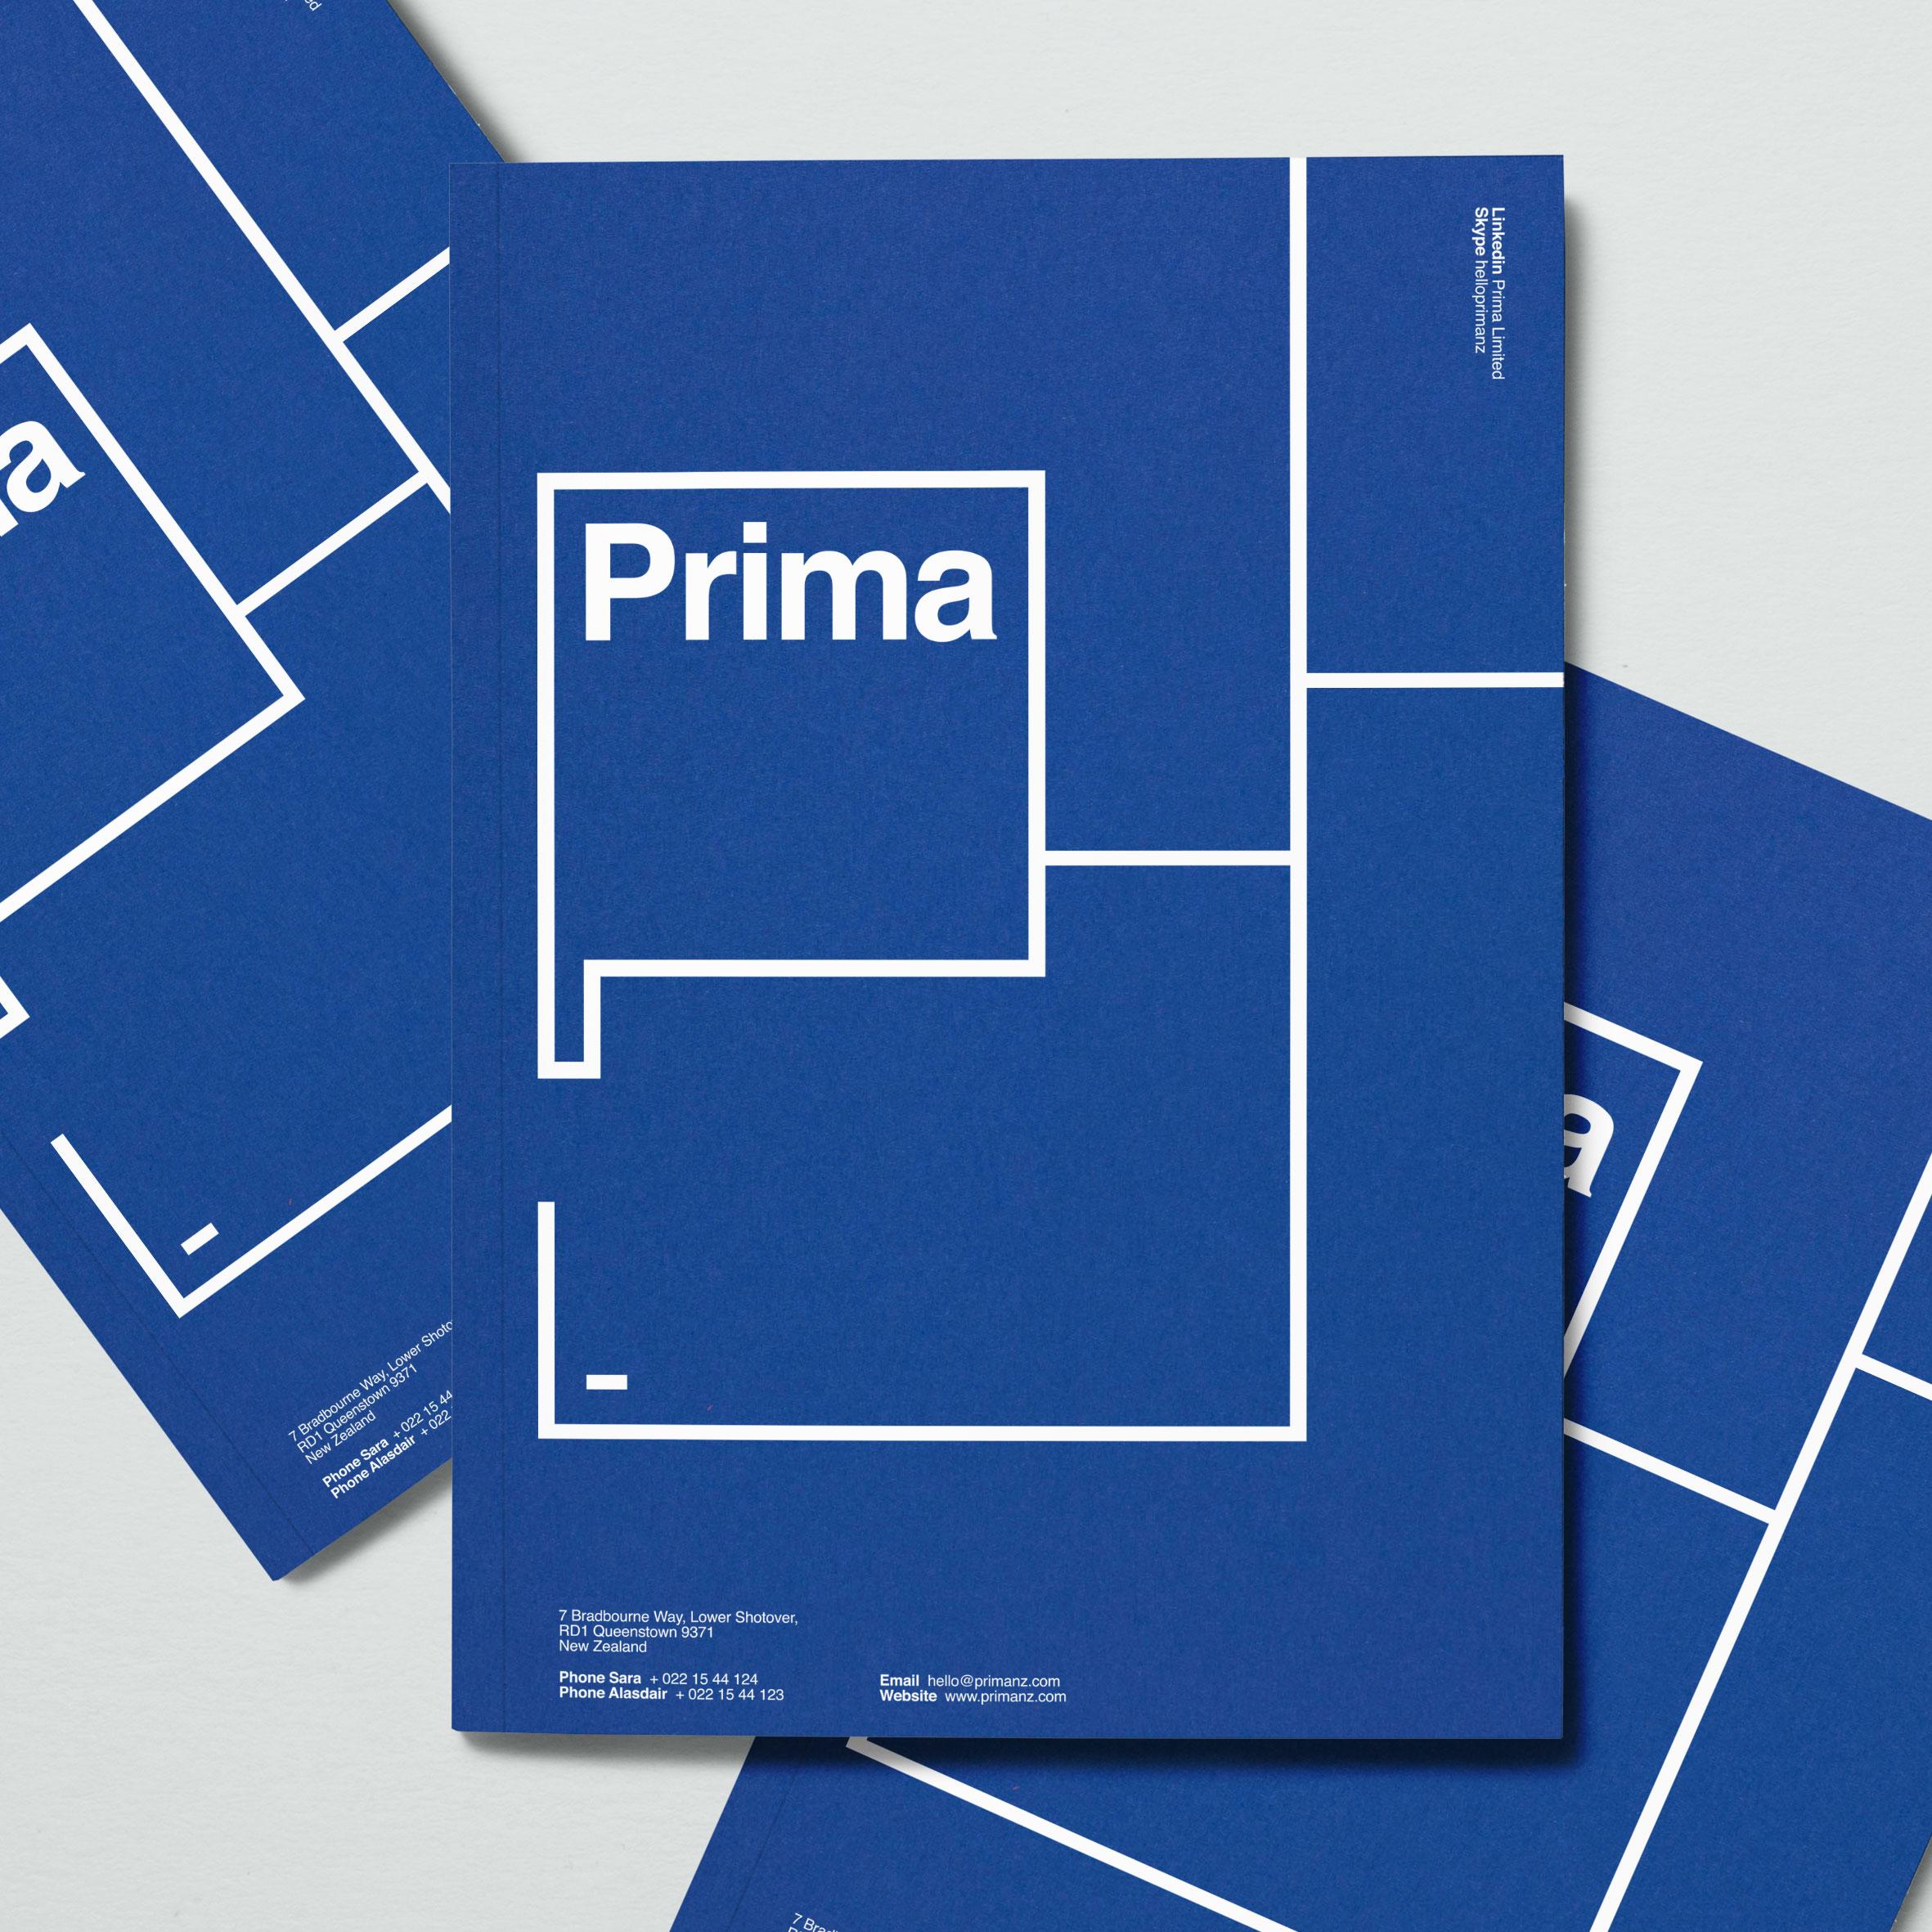 Prima  Branding—Web